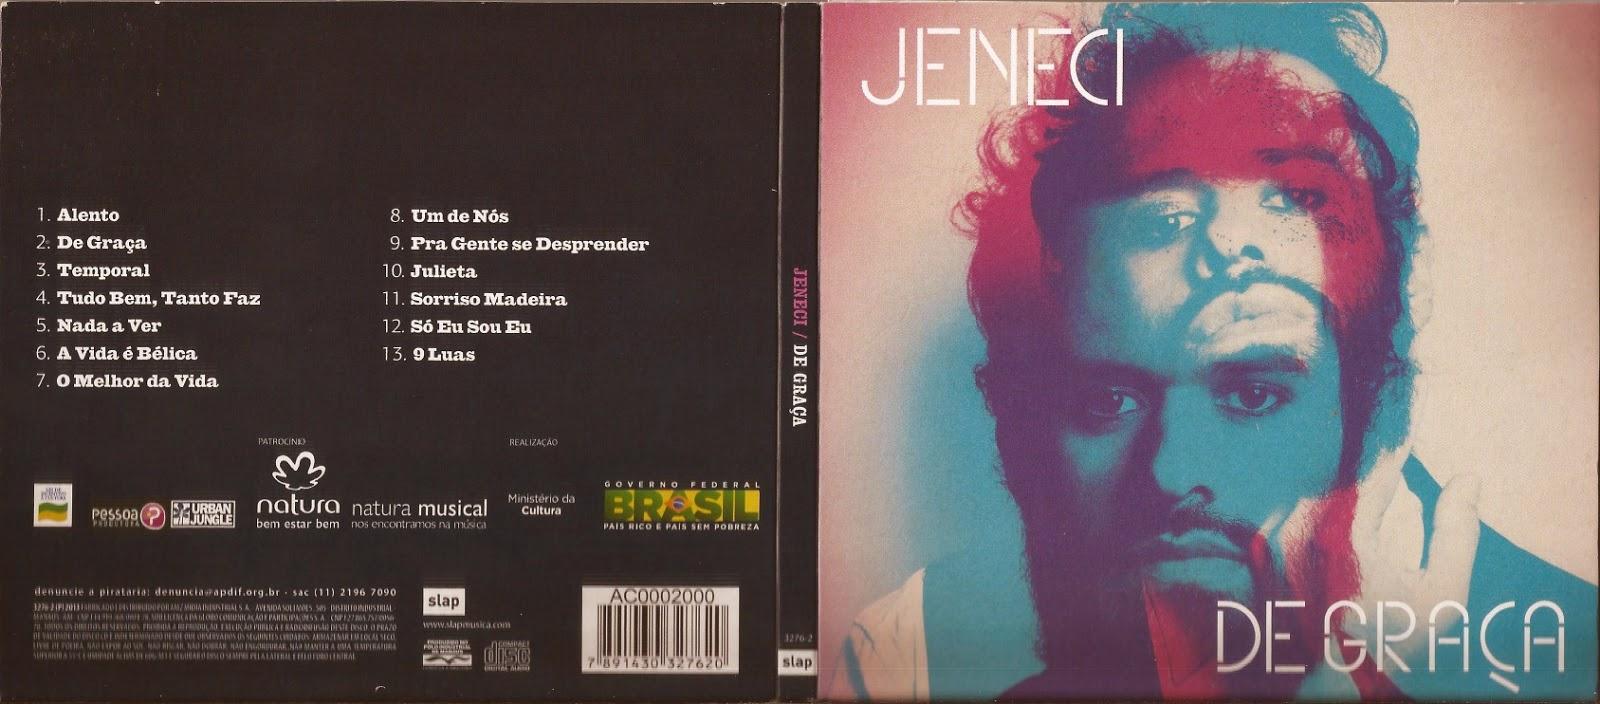 cd completo de marcelo jeneci gratis